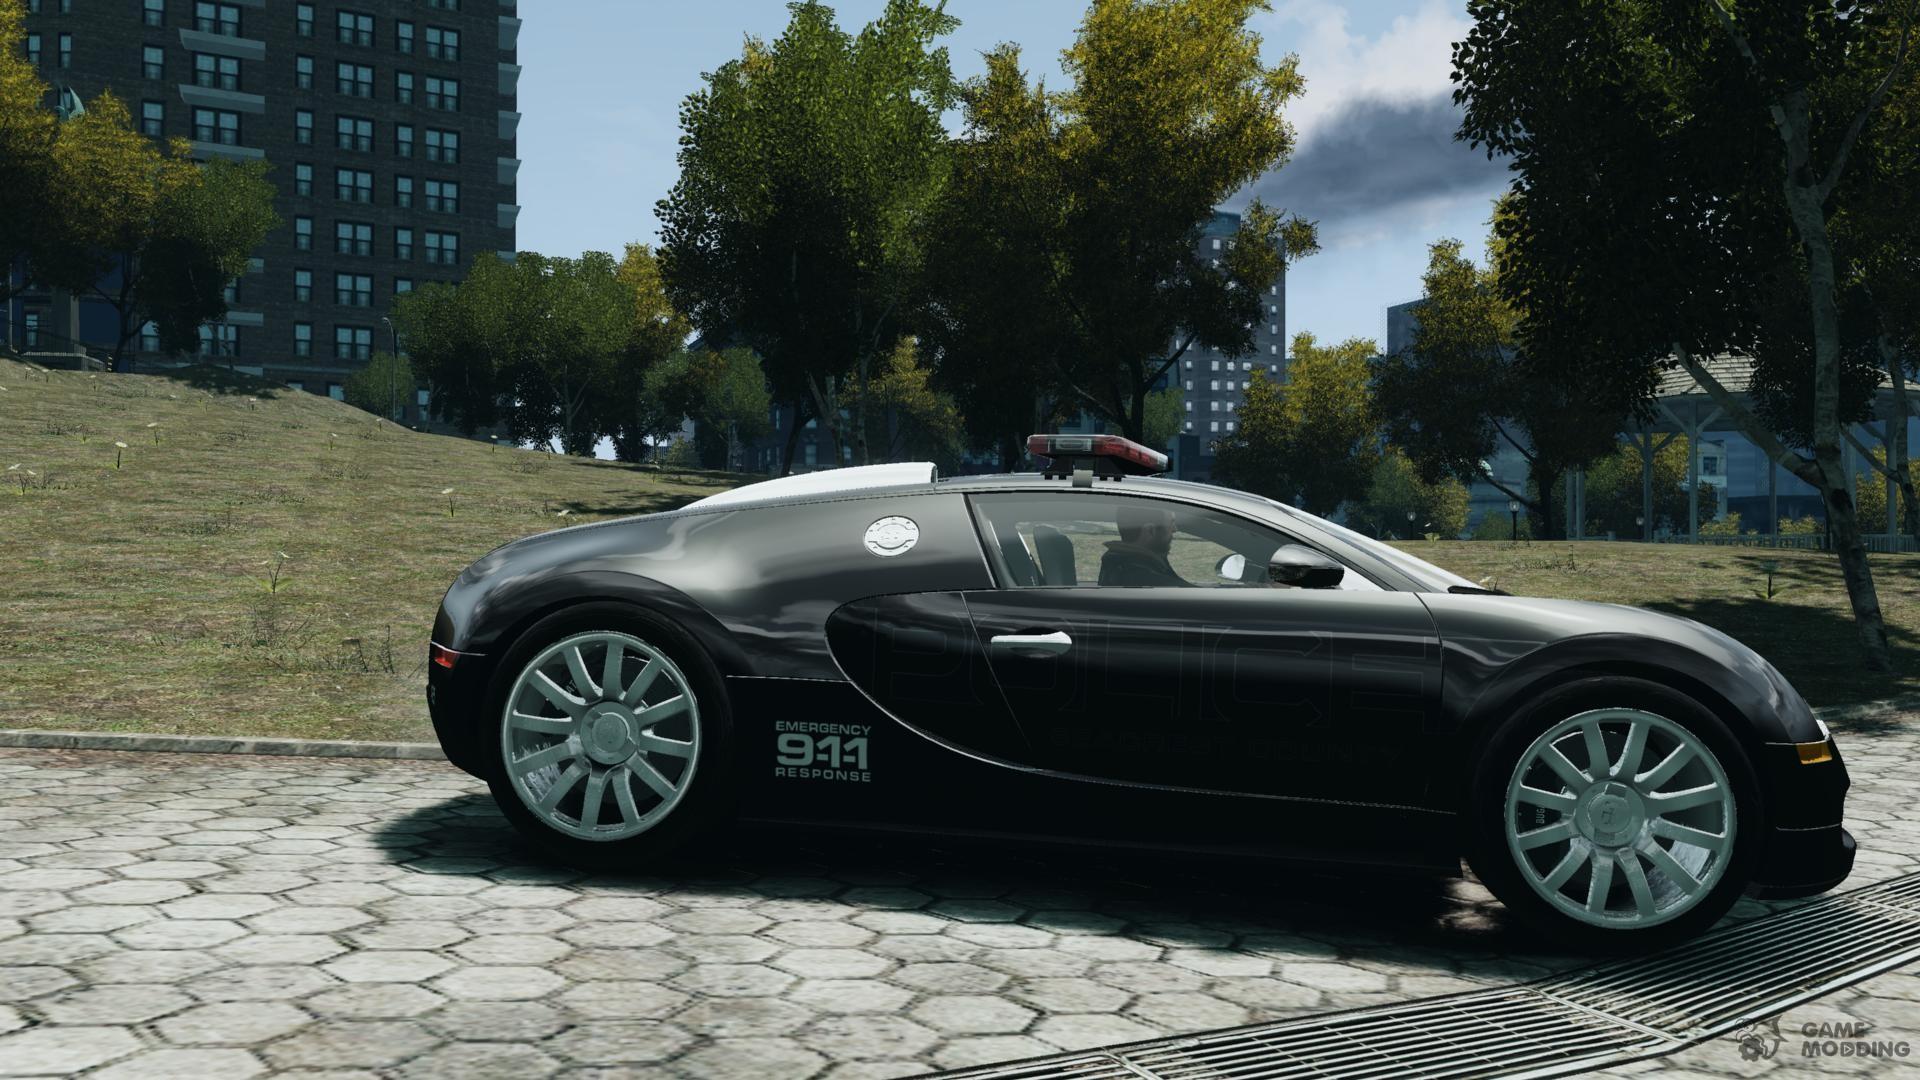 9662a9e53a905bceaea688851d16c703beadb4f15583874488cec6e570acdcae Wonderful Bugatti Veyron Xbox 360 Games Cars Trend